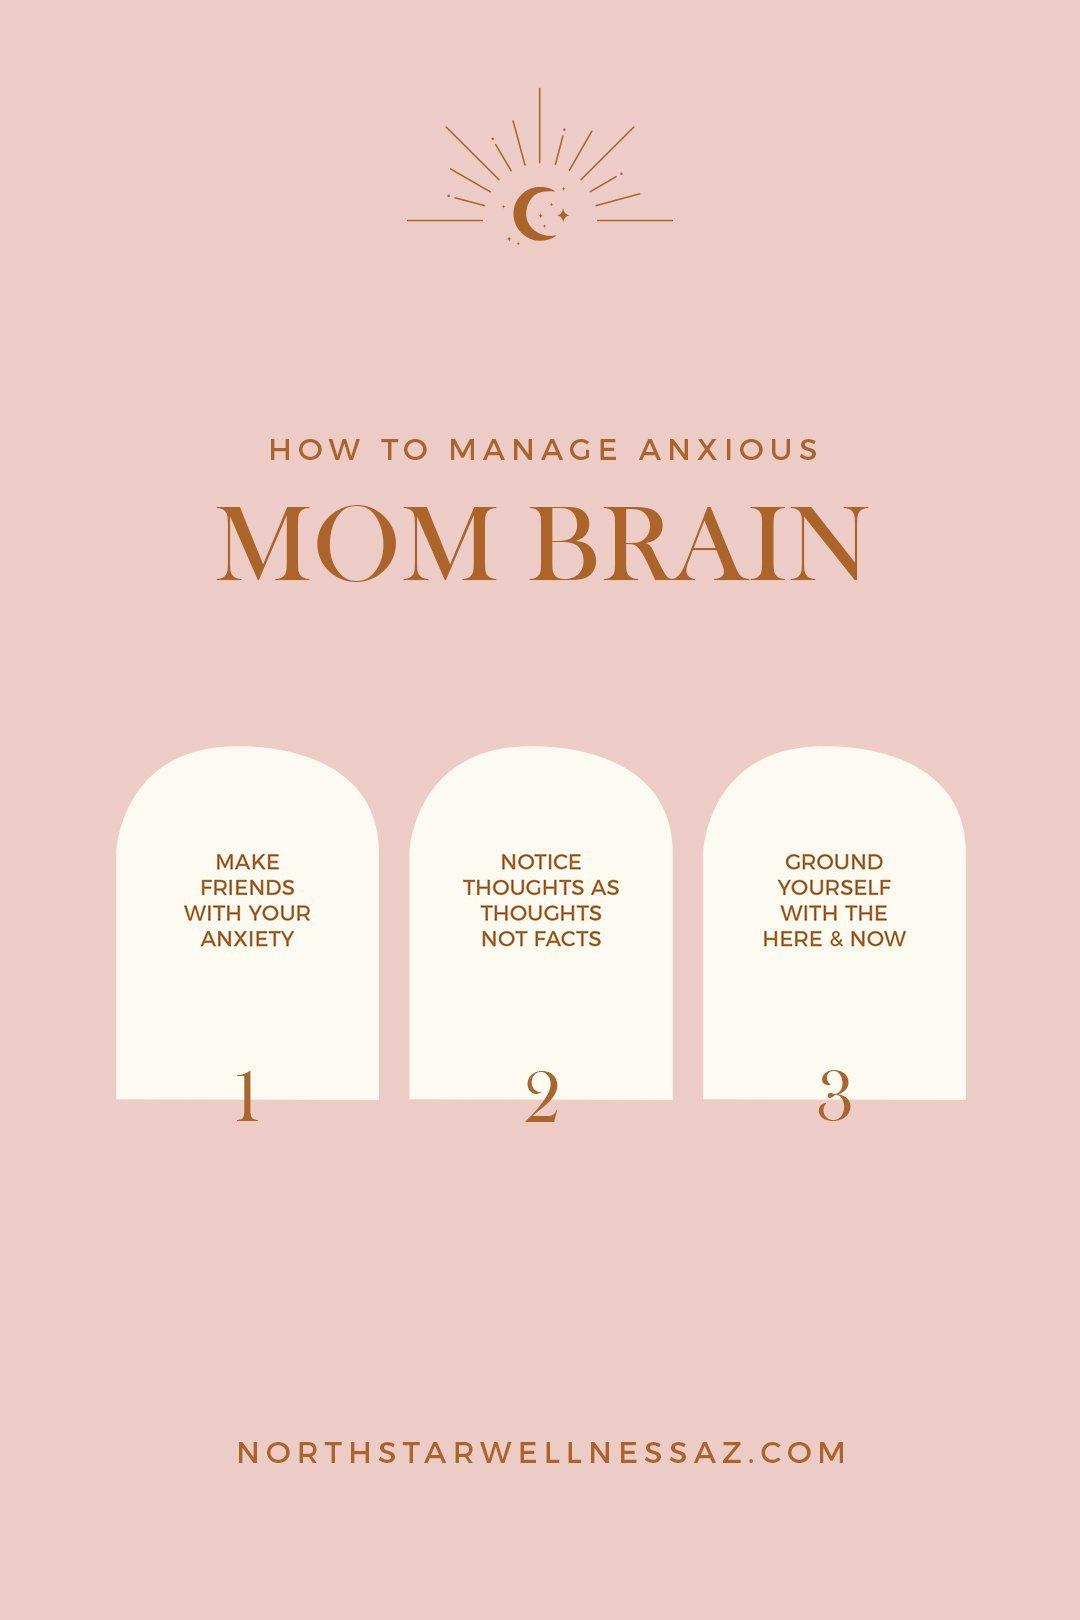 3 Ways to Manage Anxious Mom Brain